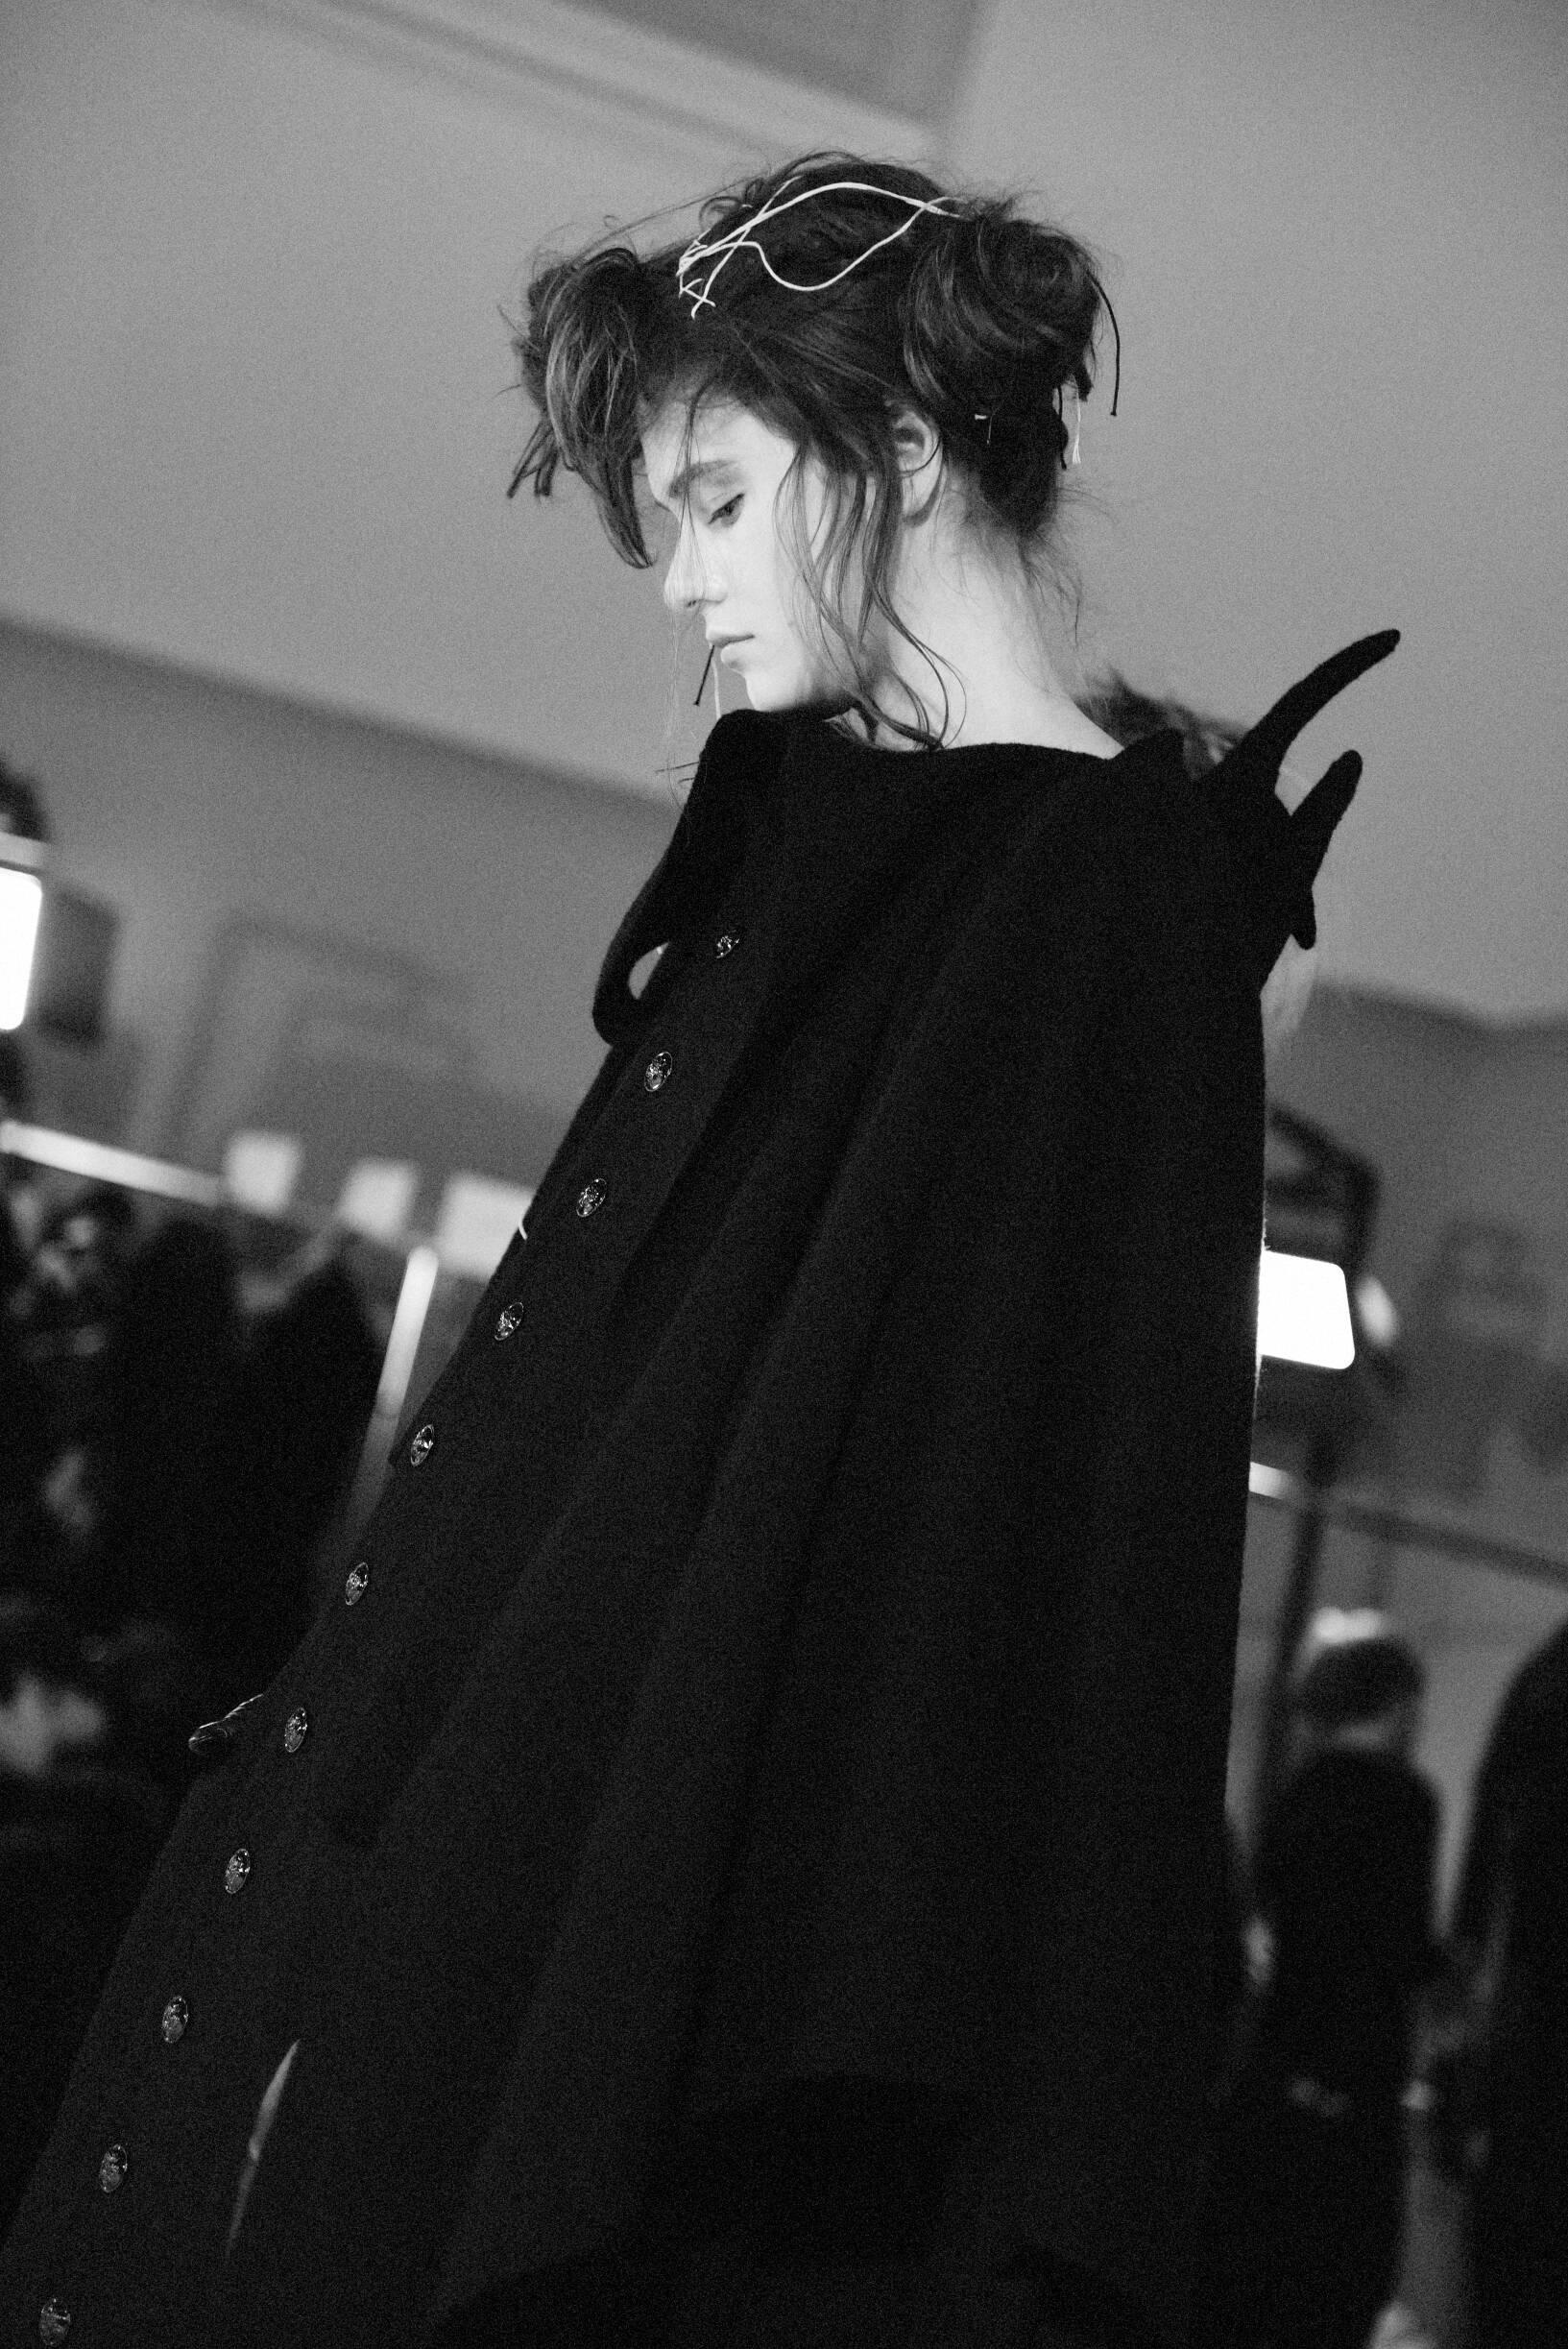 Model 2019-20 Backstage Yohji Yamamoto